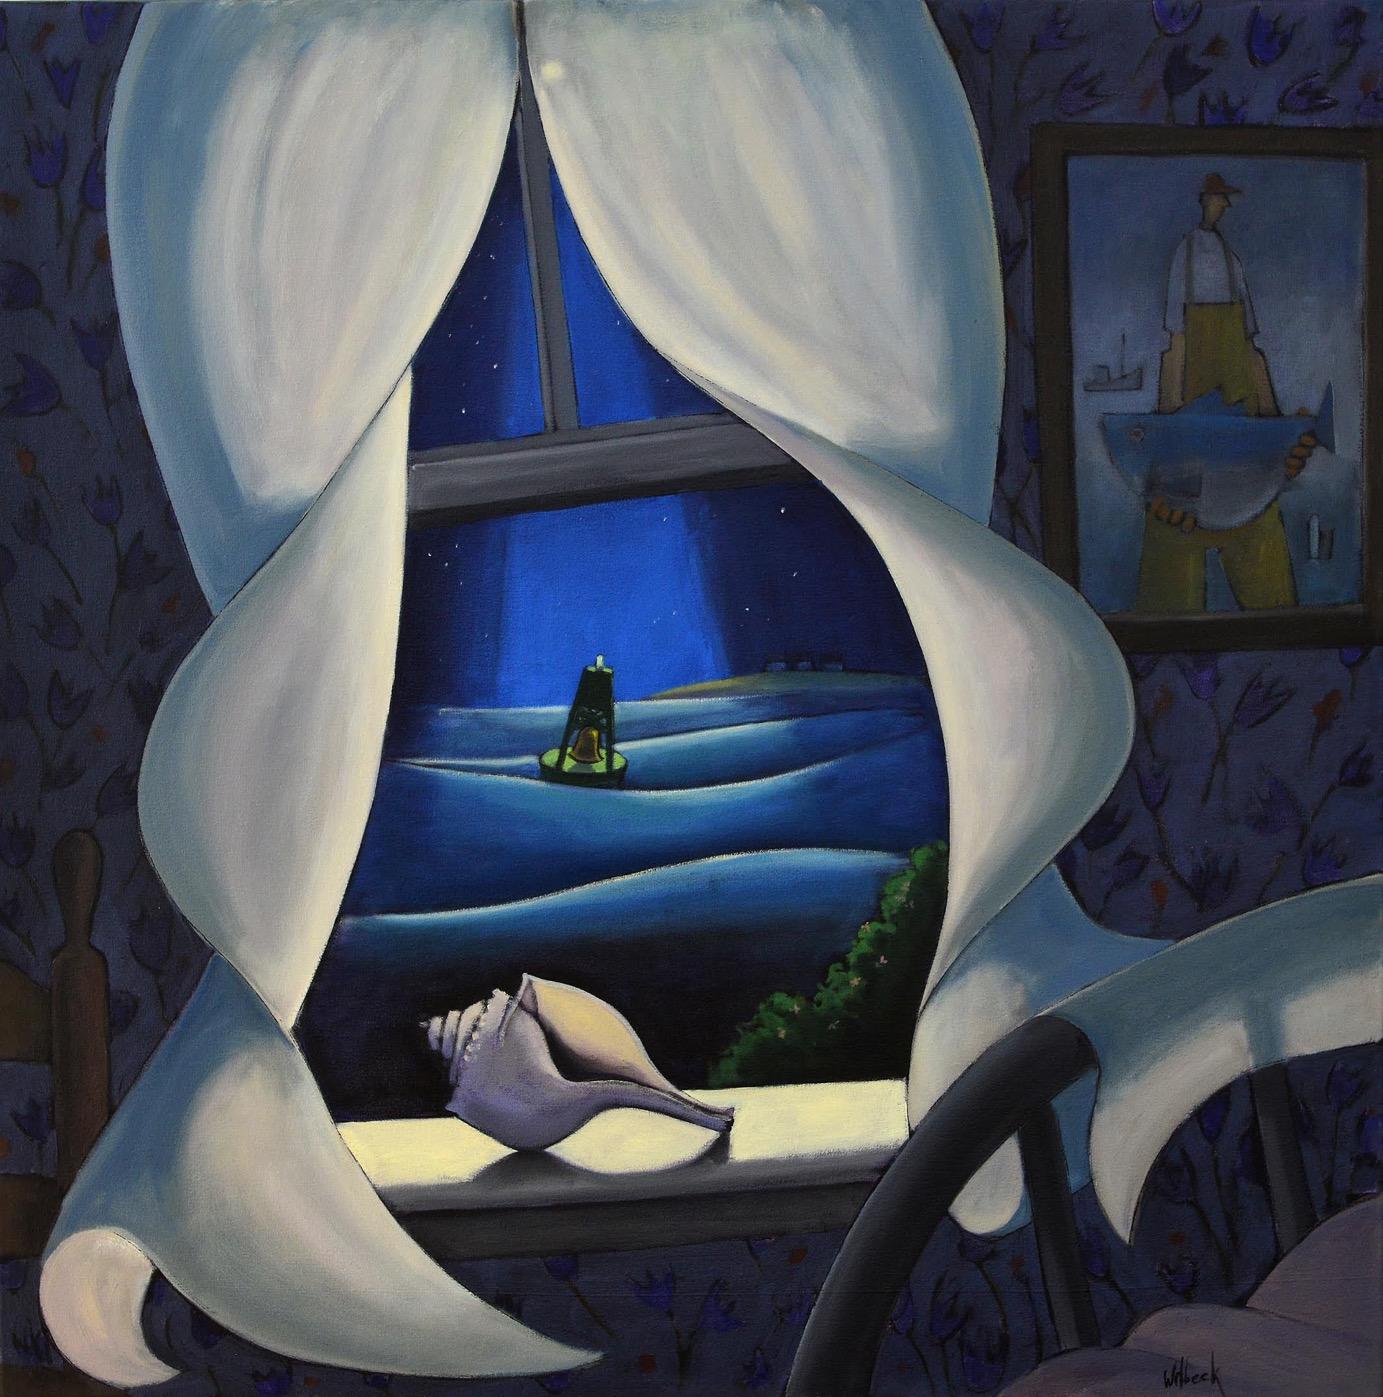 Bellbuoy in the Night